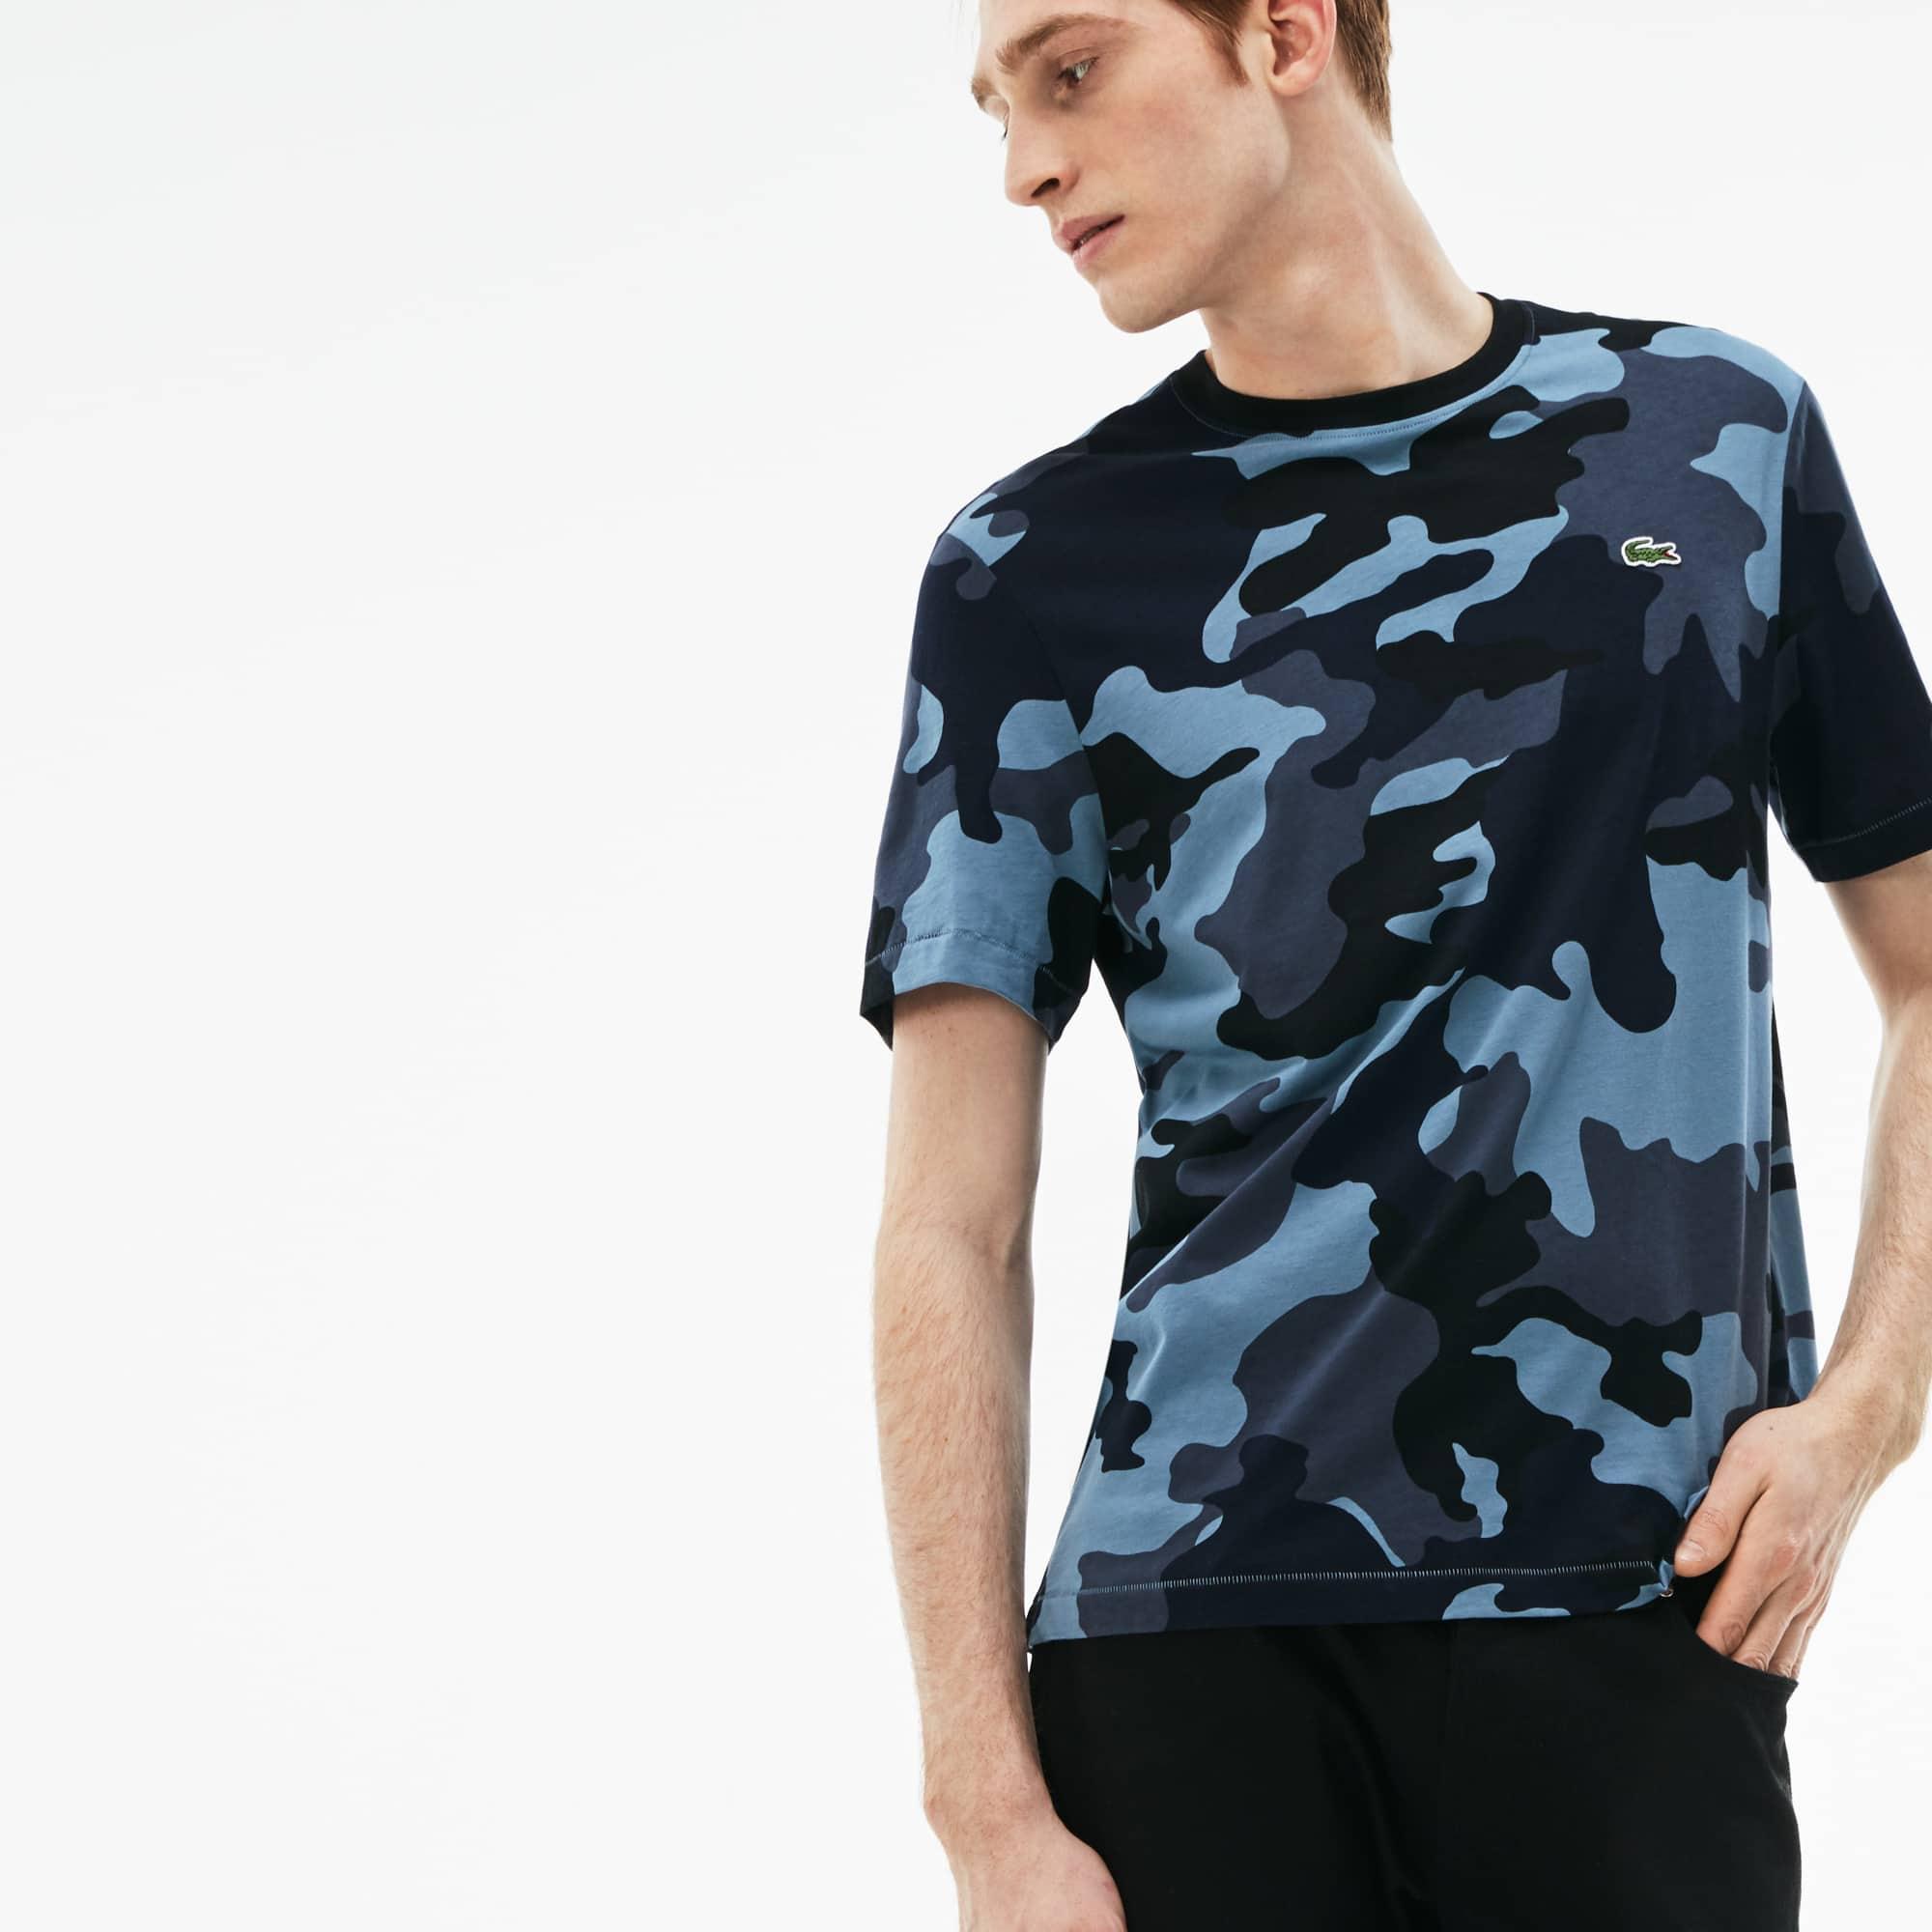 Men's LIVE Crew Neck Camouflage Print Jersey T-shirt